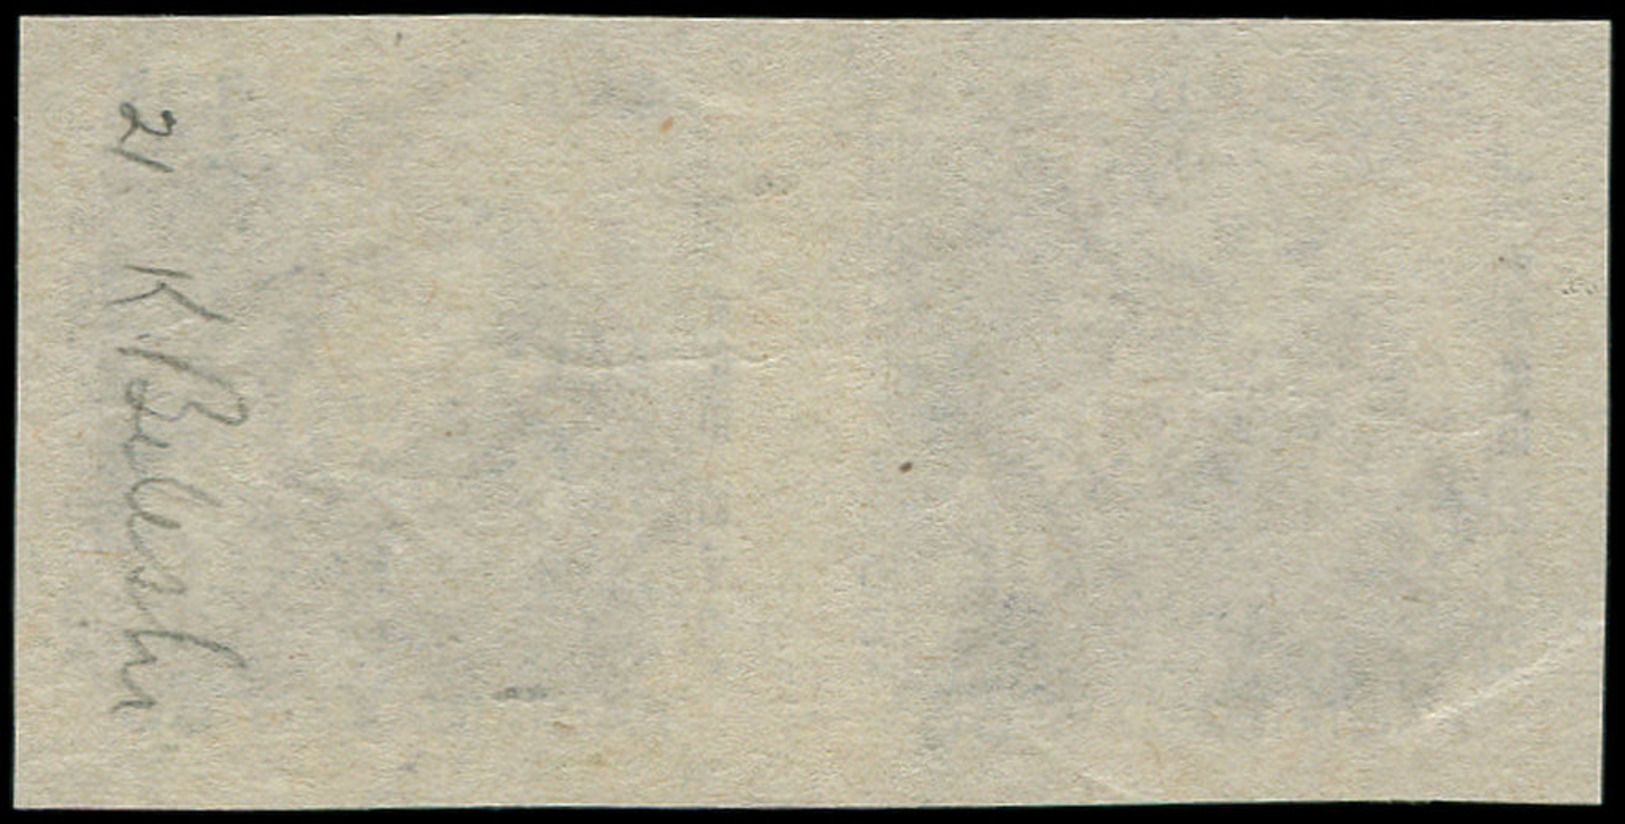 (*) BRESIL - Poste - 422, Paire Non Dentelée, Double Impression (papier Fin): Rio Grande - Brazil